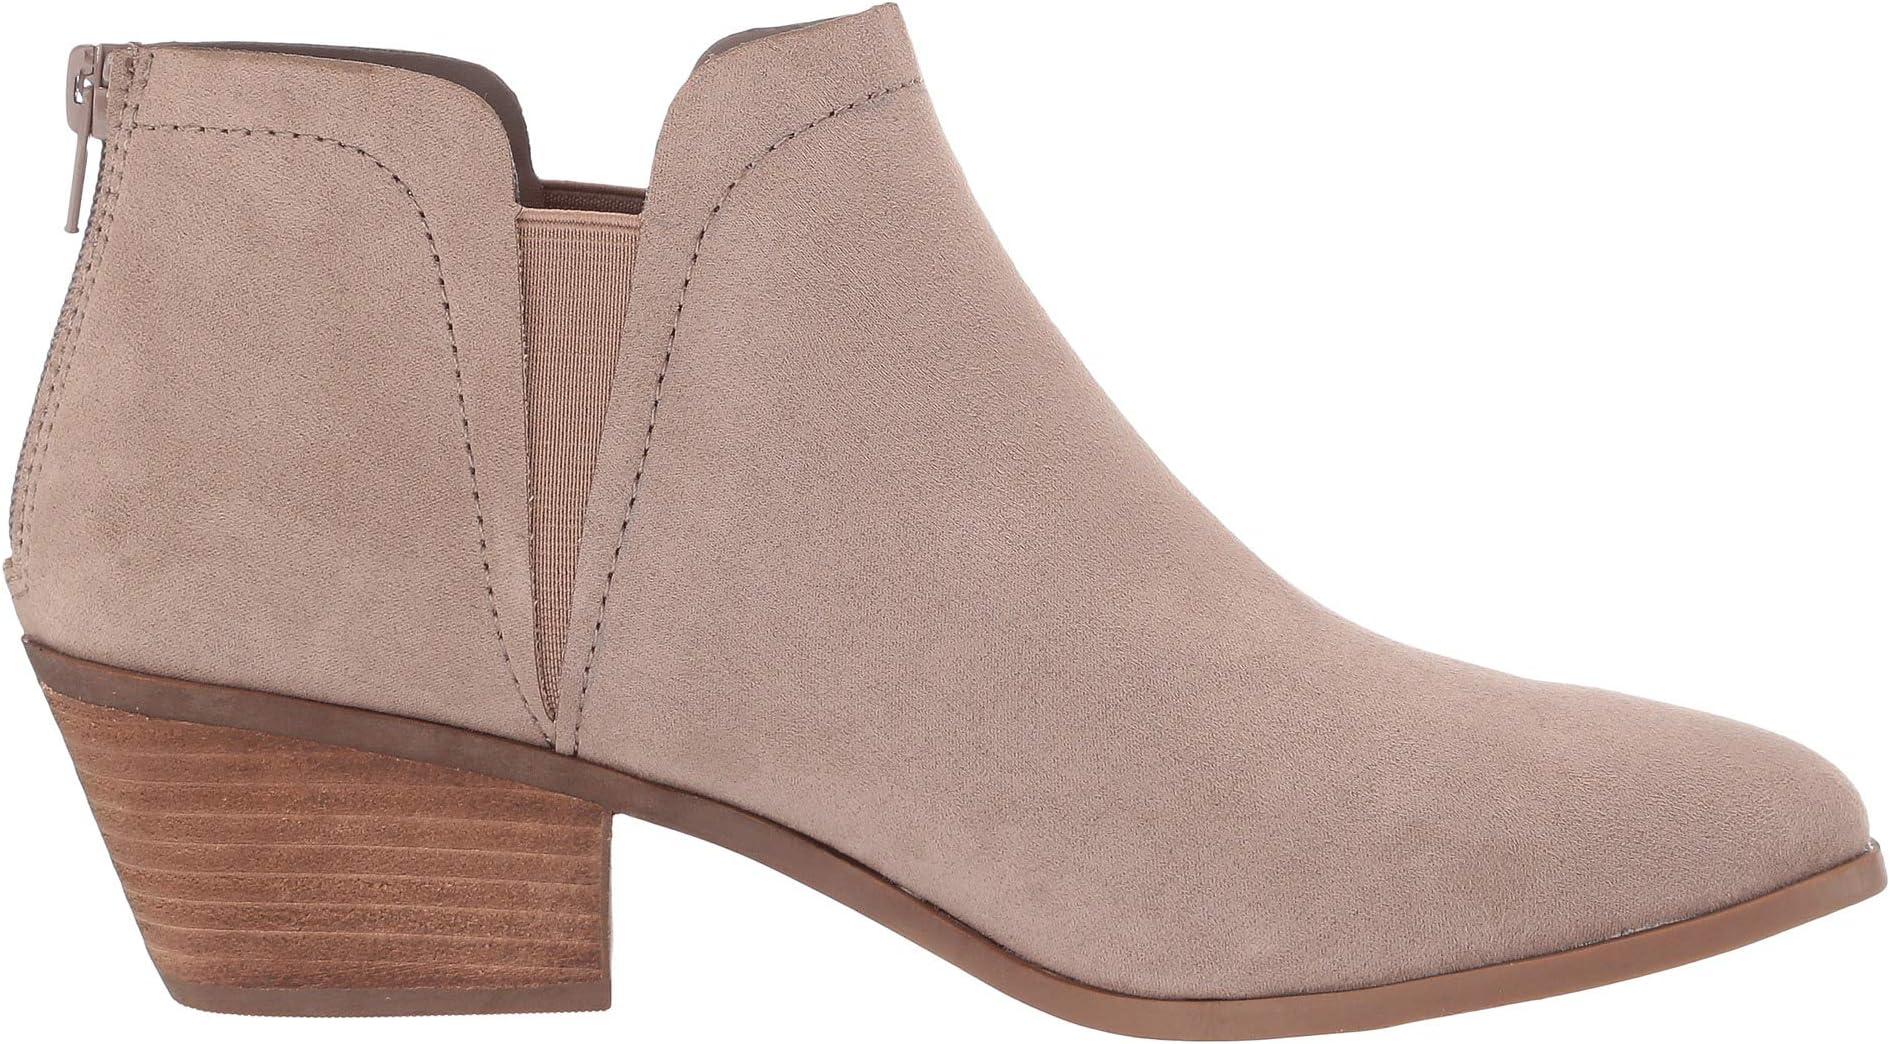 CARLOS by Carlos Santana Malika | Women's shoes | 2020 Newest